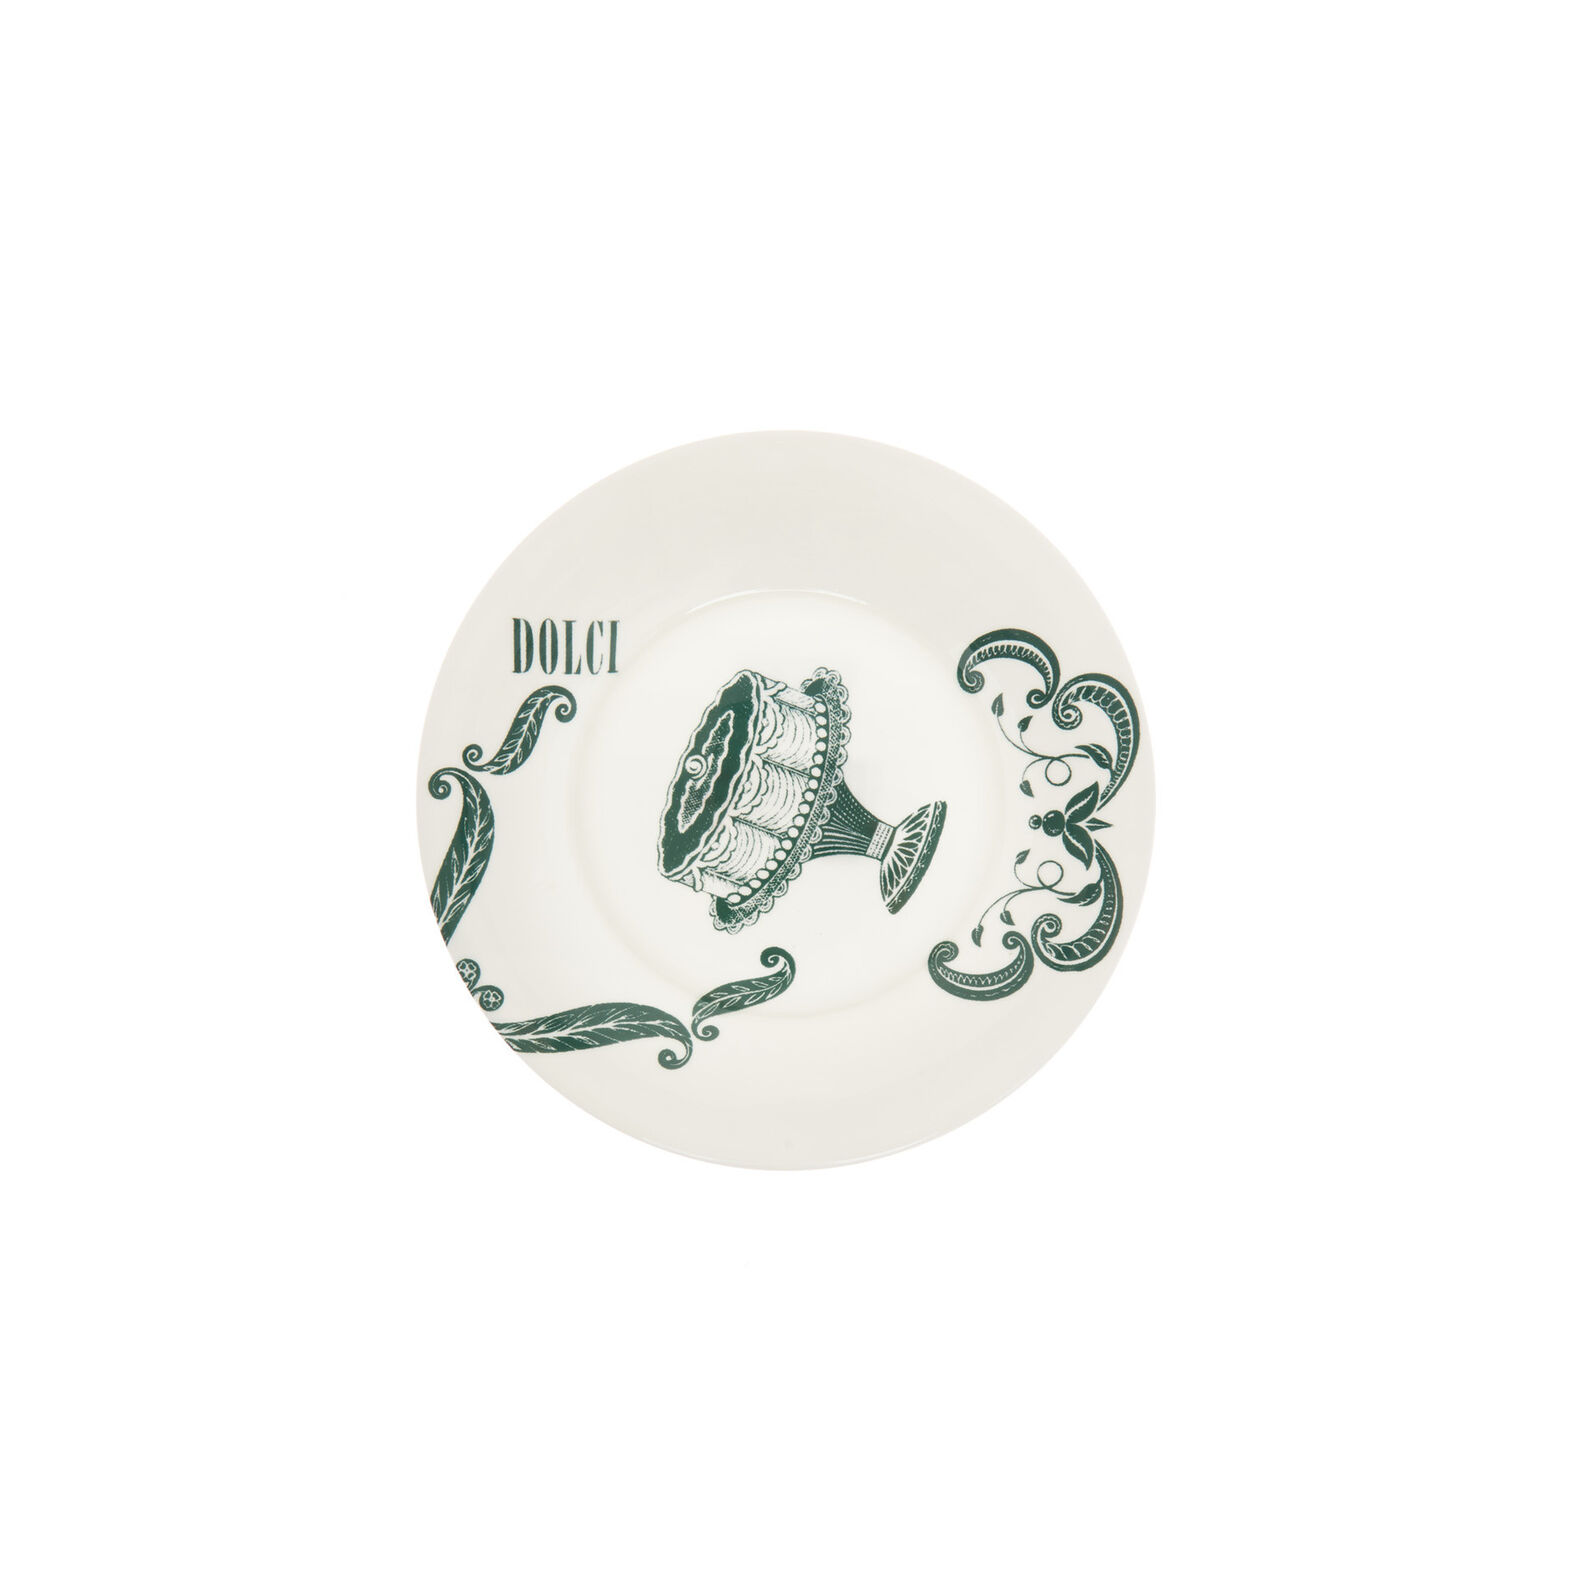 Fine bone china side plate with vintage La Cucina Italiana decoration